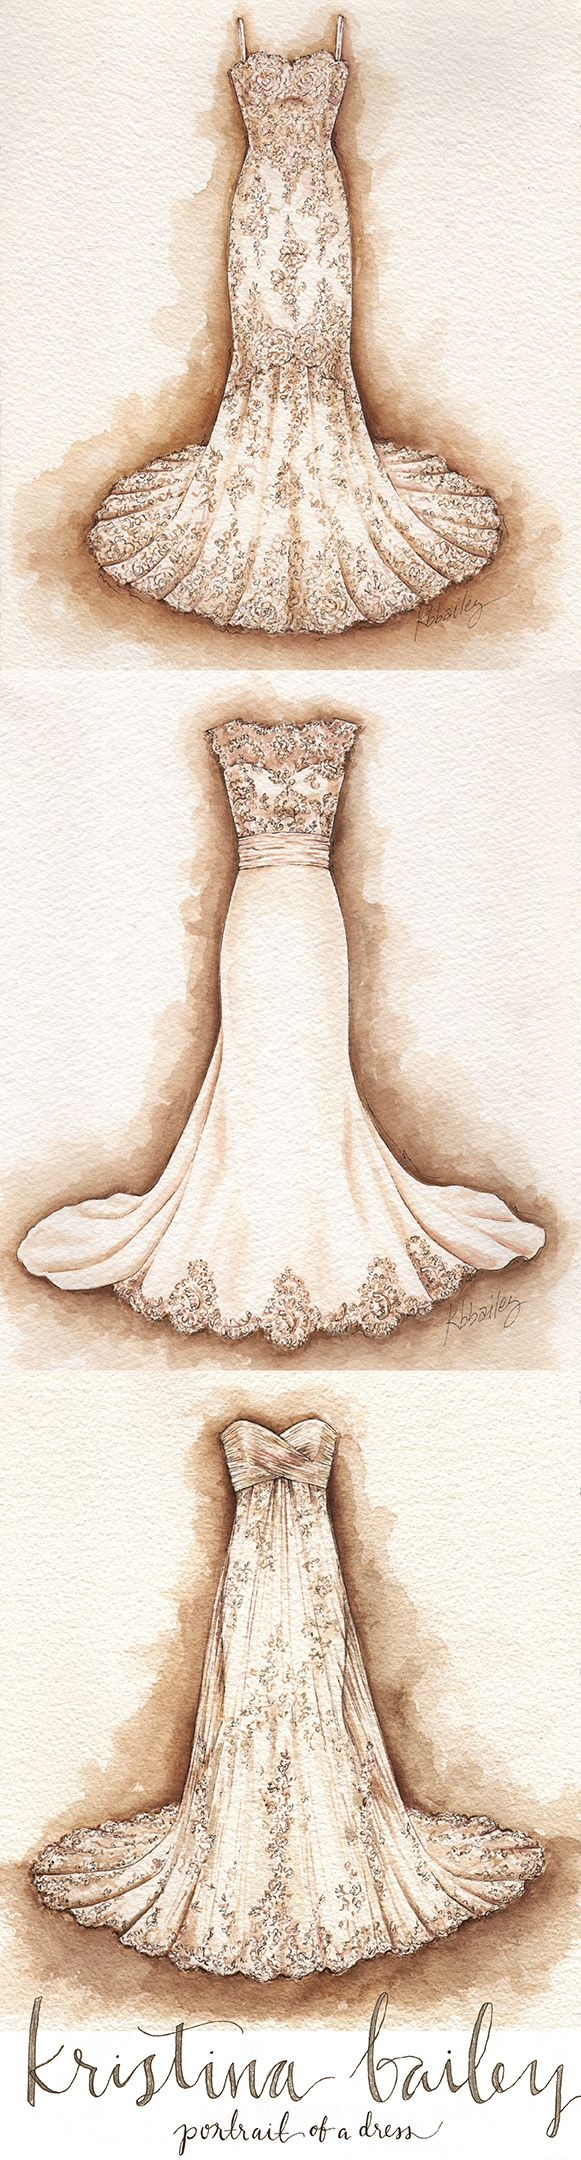 A few favorite Wedding Dress Portraits By Kristina Bailey 2014 #weddingdresspainting #portraitofadress #weddingdress www.PortraitOfADress.com